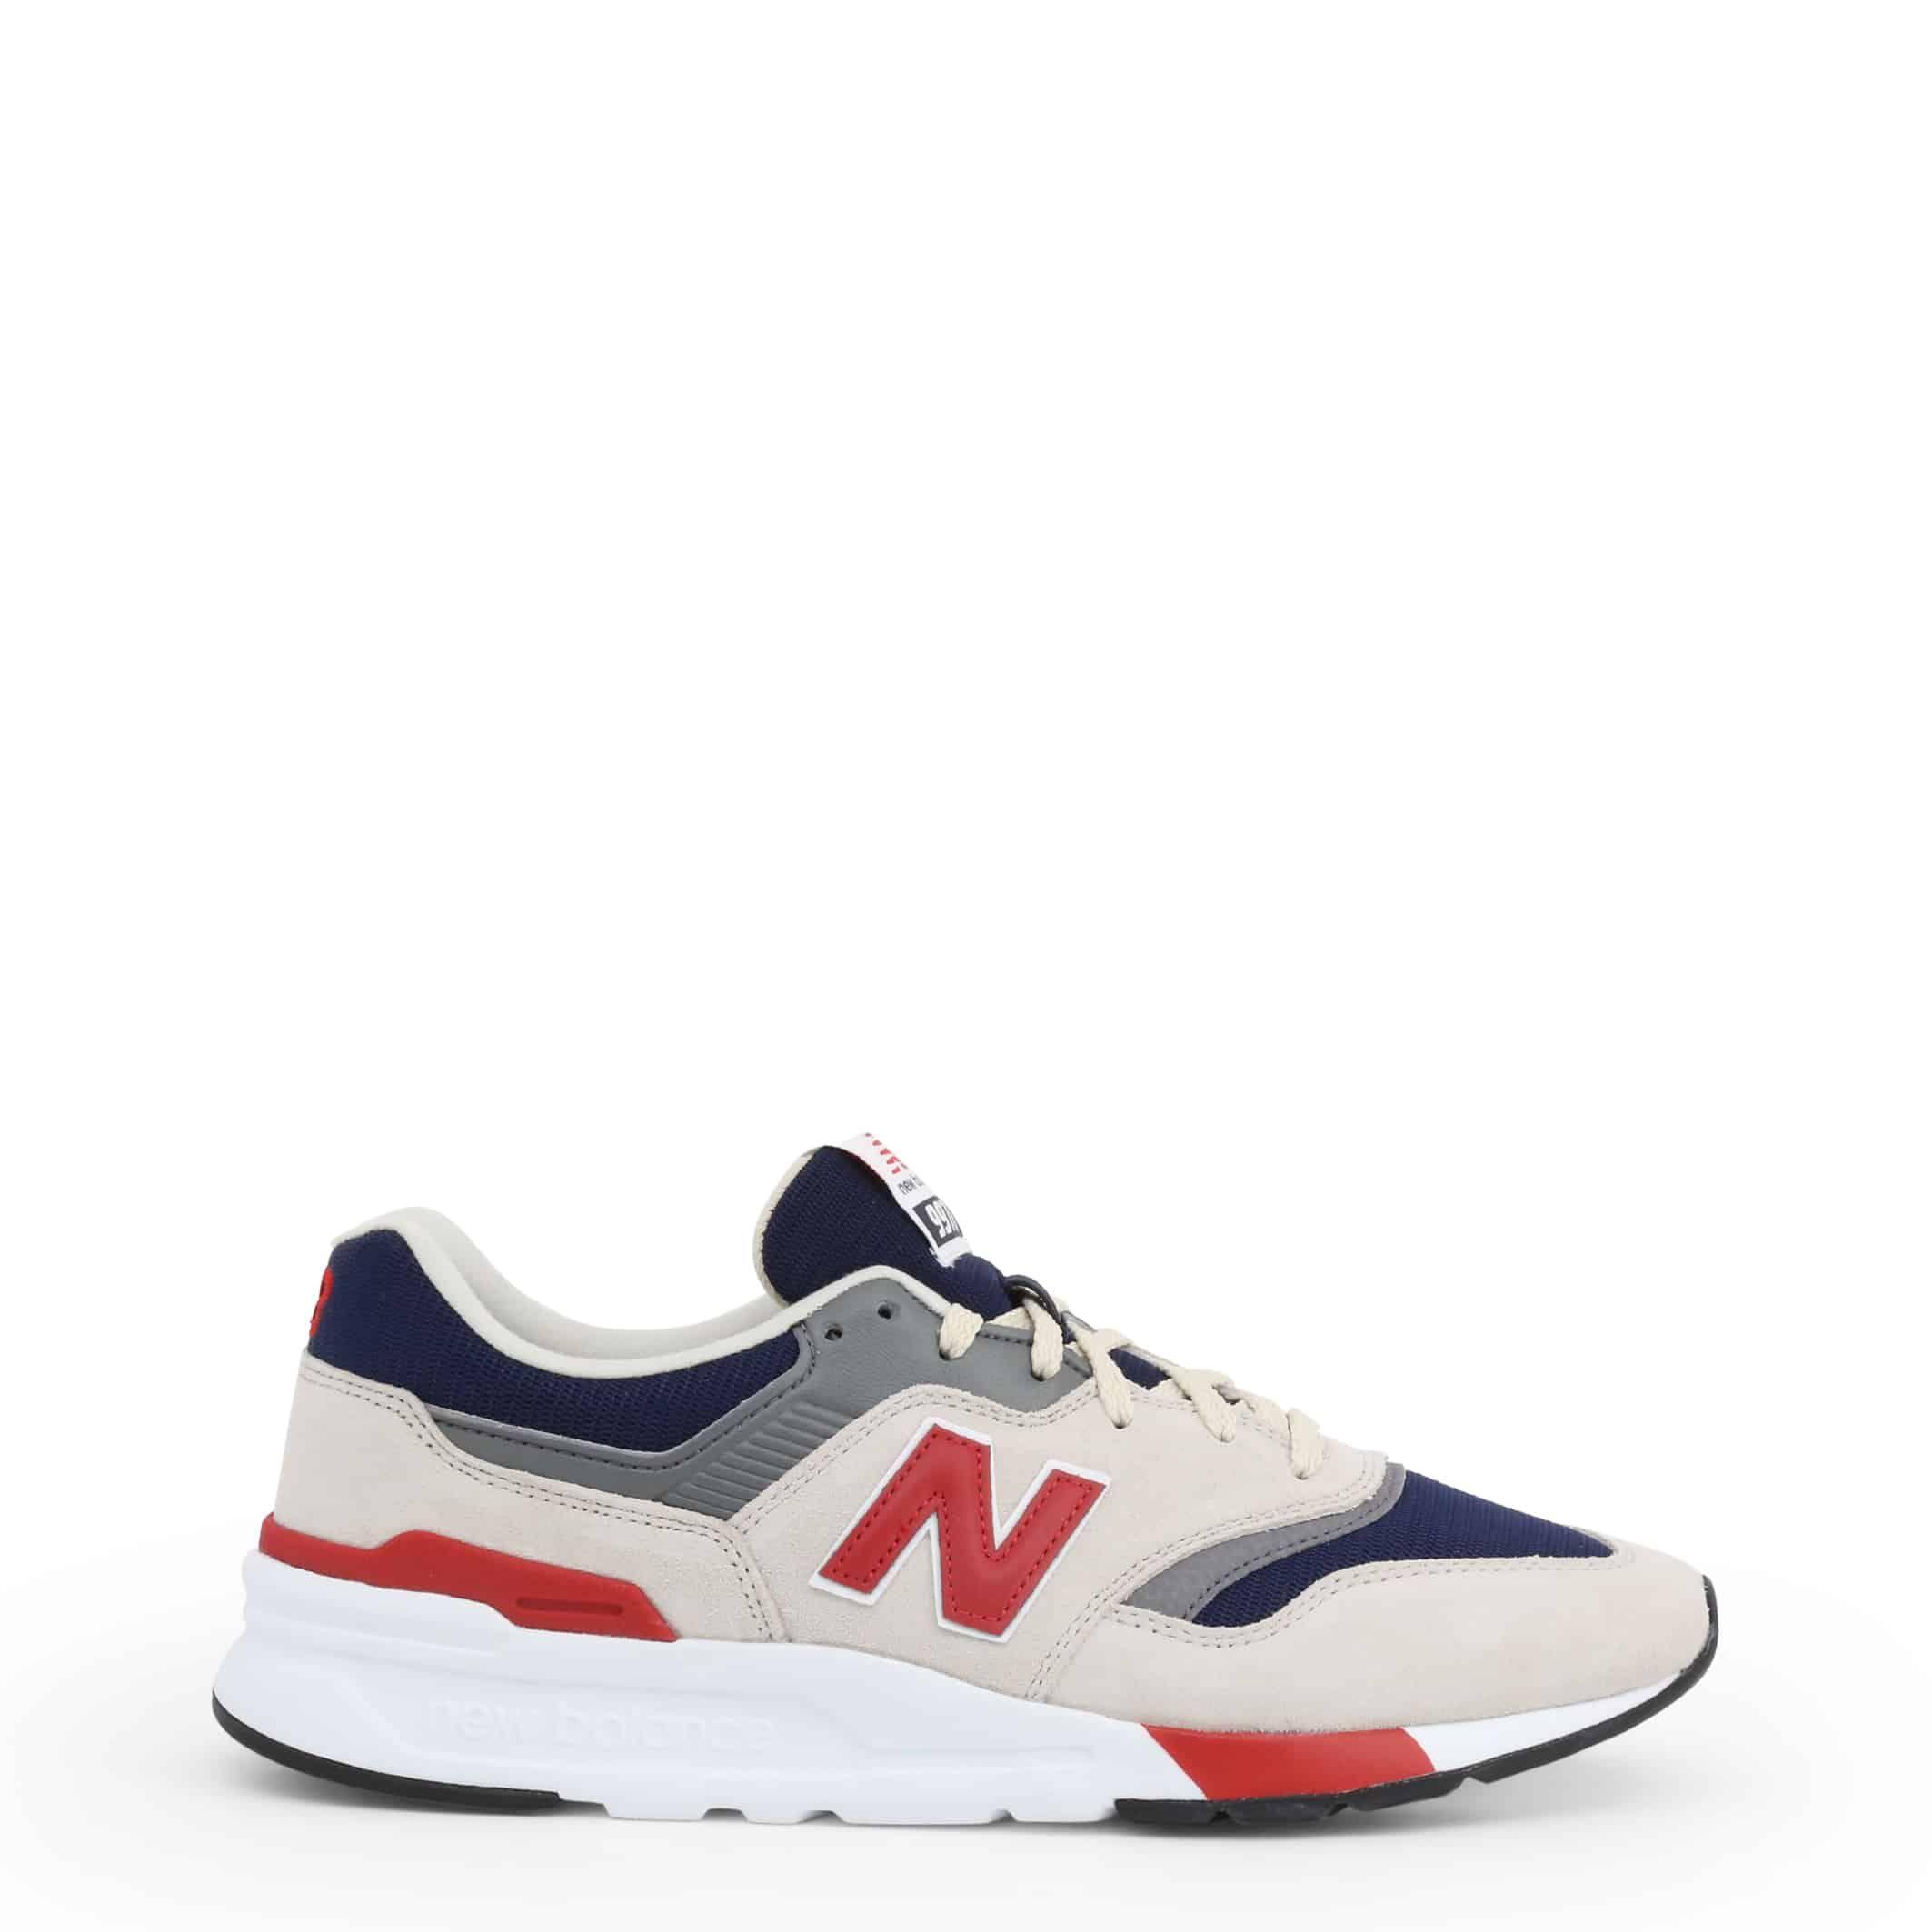 Chaussures New Balance – ML574